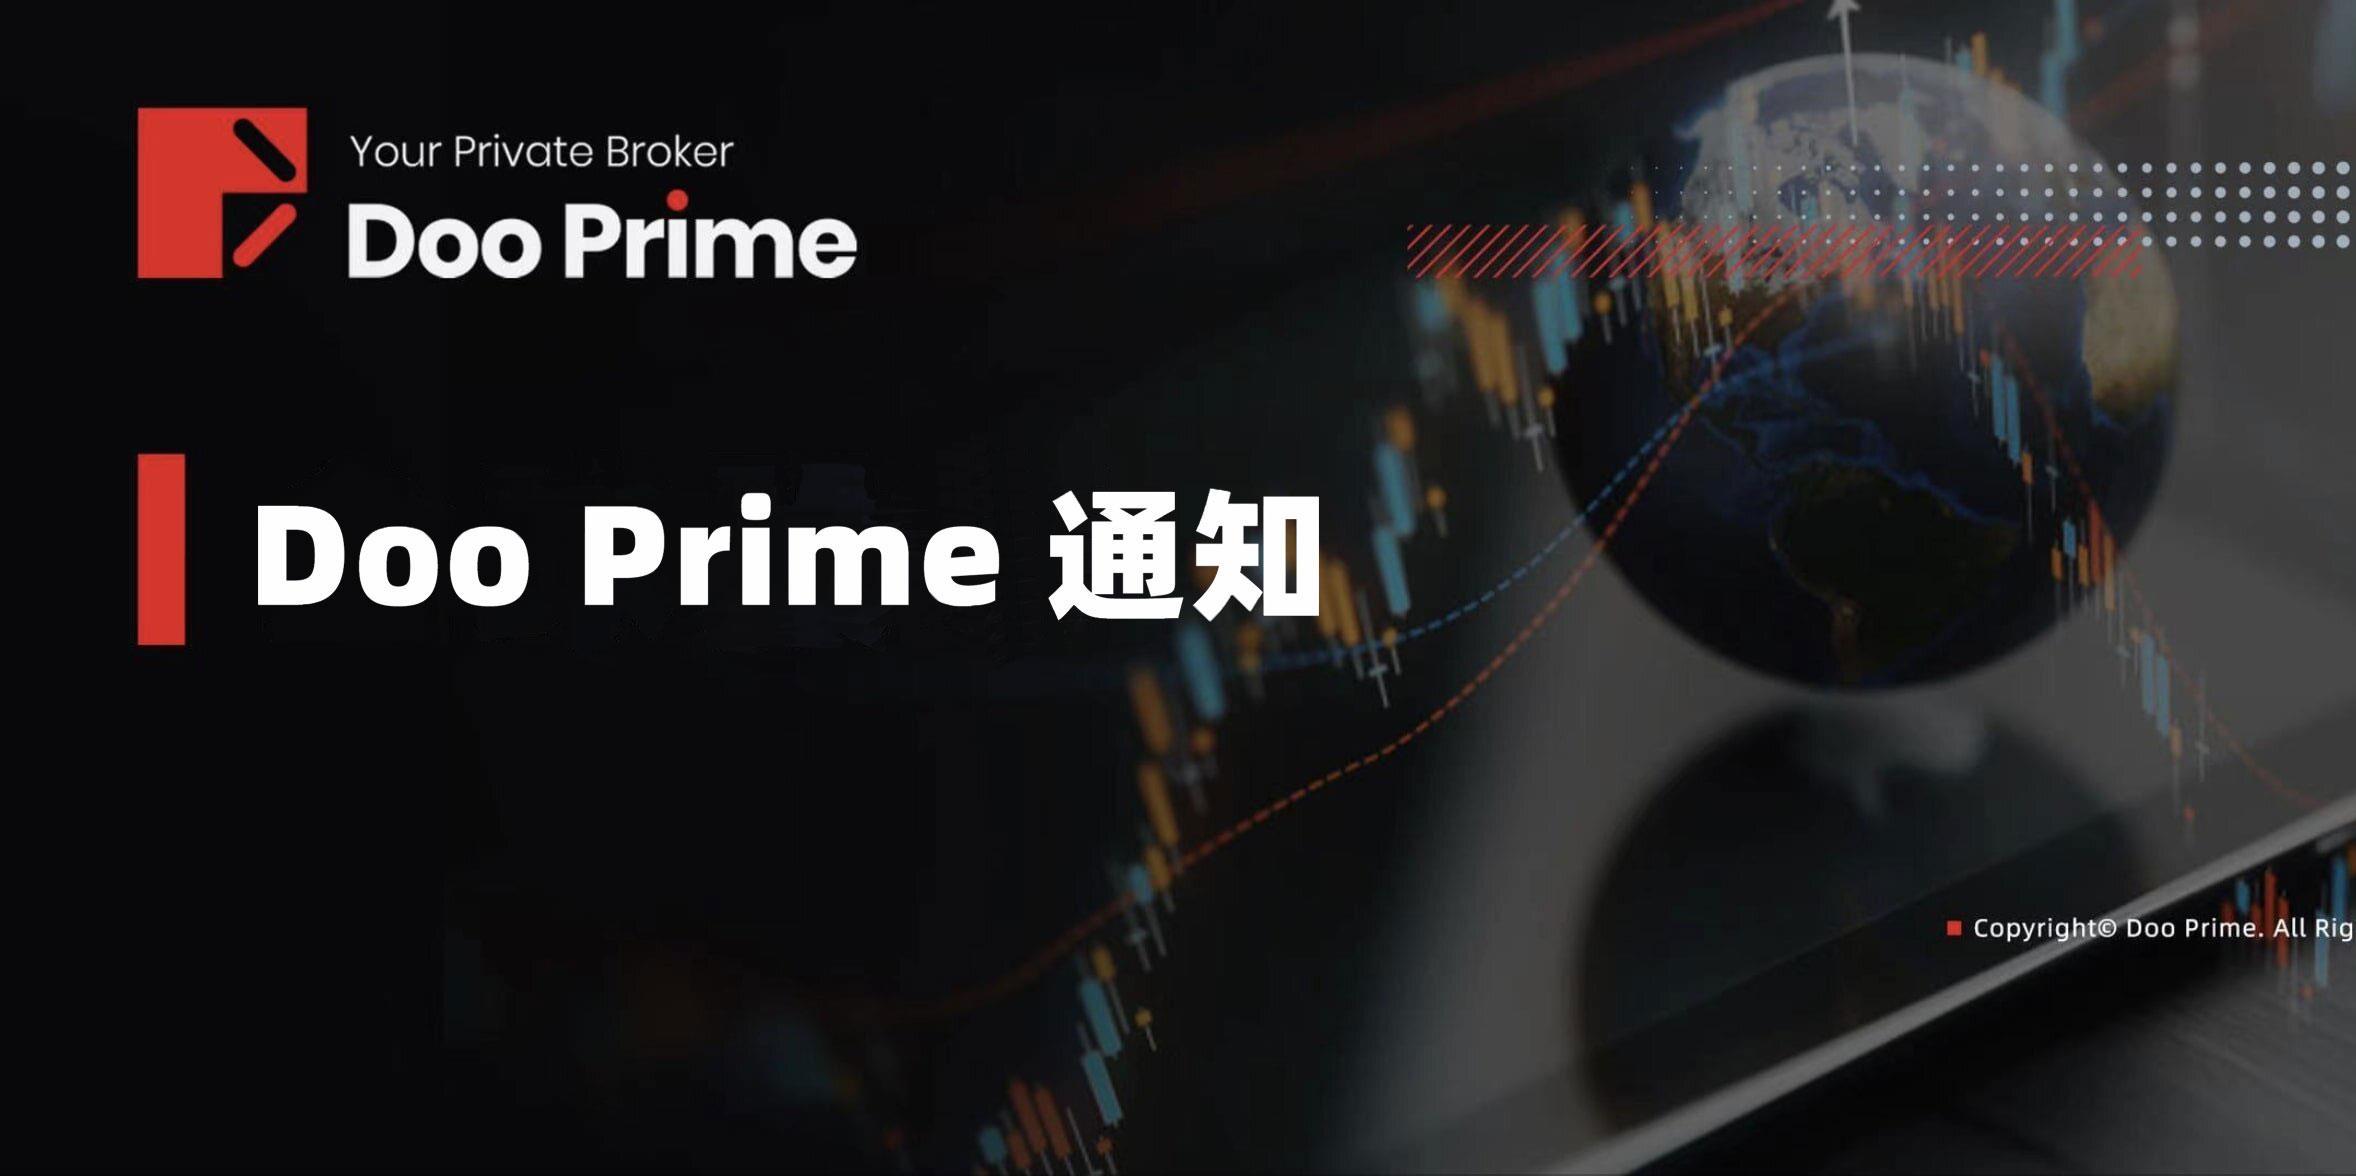 Doo Prime 部分产品杠杆调整通知